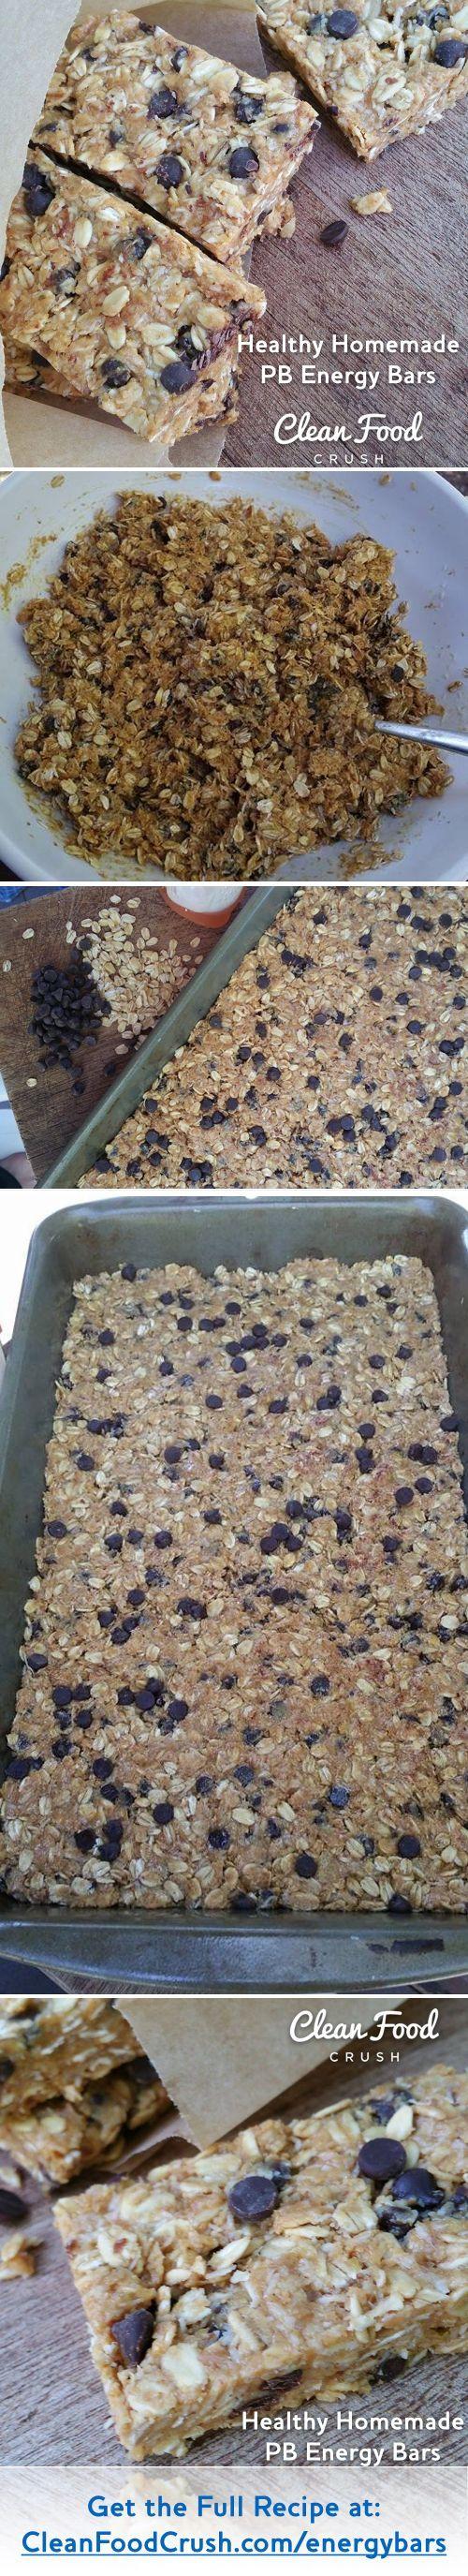 Clean Eating Healthy Homemade PB Energy Bars CleanFoodCrush http://cleanfoodcrush.com/No-Bake-Energy-Bars